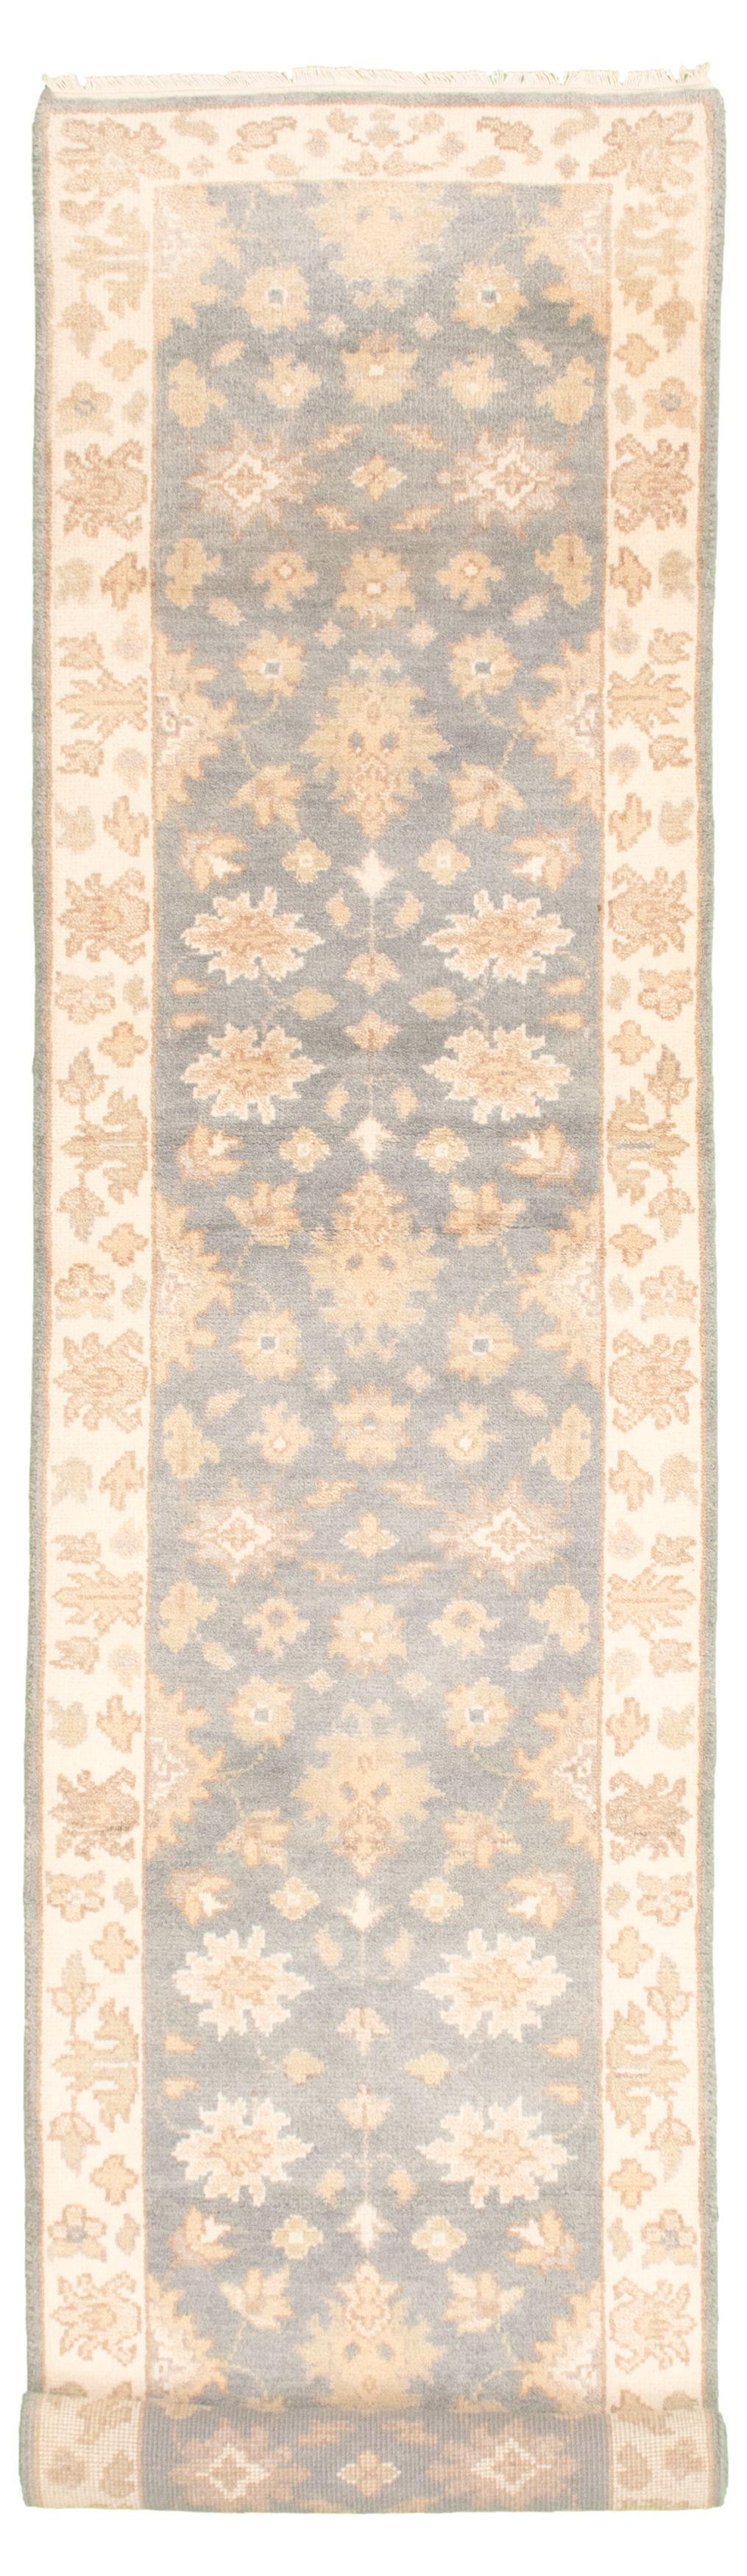 "Hand-knotted Royal Ushak Light Denim Blue Wool Rug 2'6"" x 11'9"" Size: 2'6"" x 11'9"""